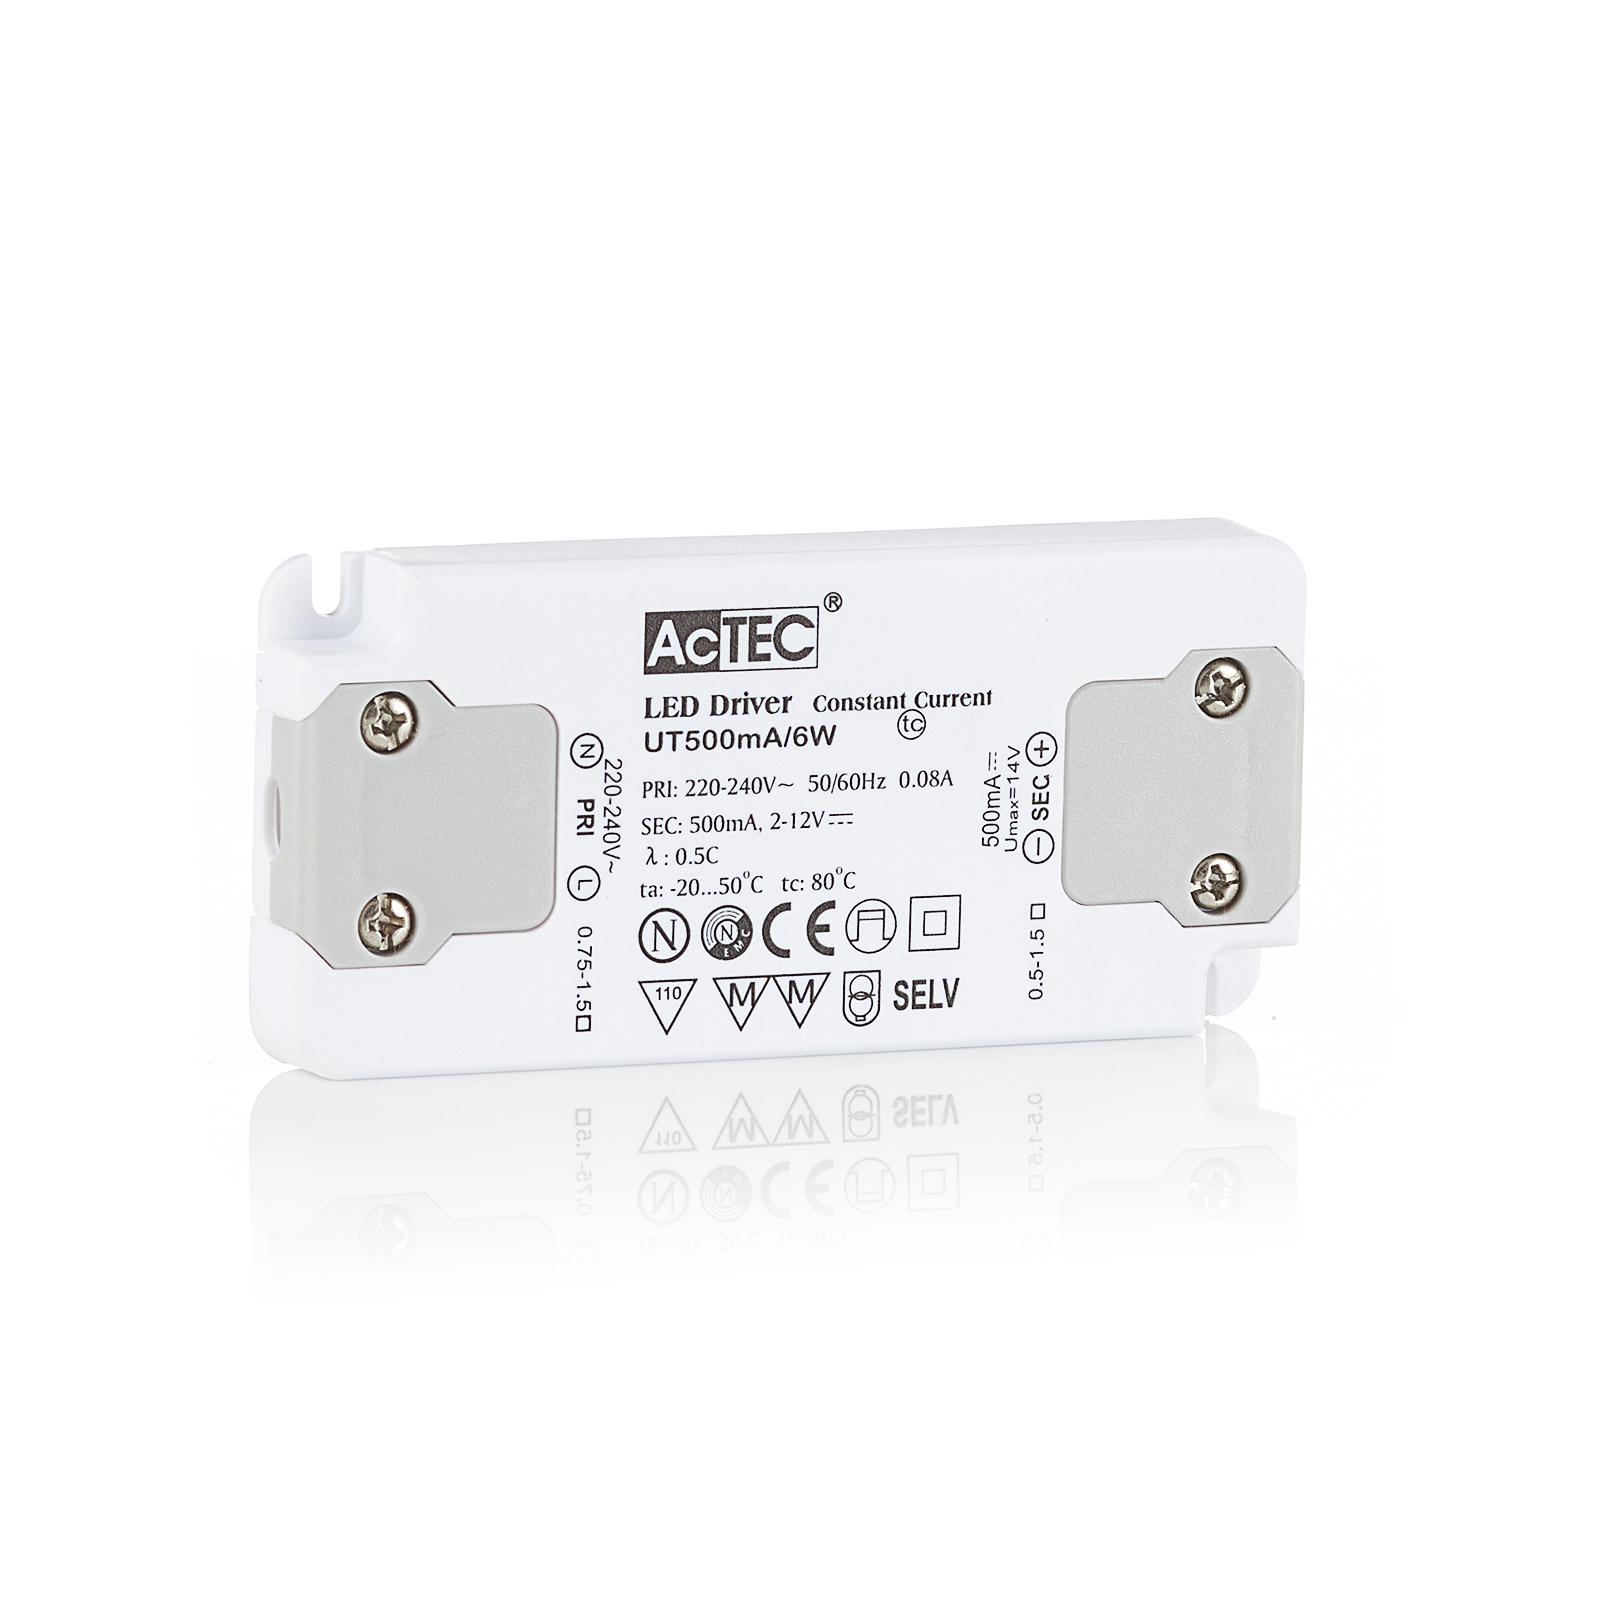 AcTEC Slim LED-Treiber CC 500mA, 6W